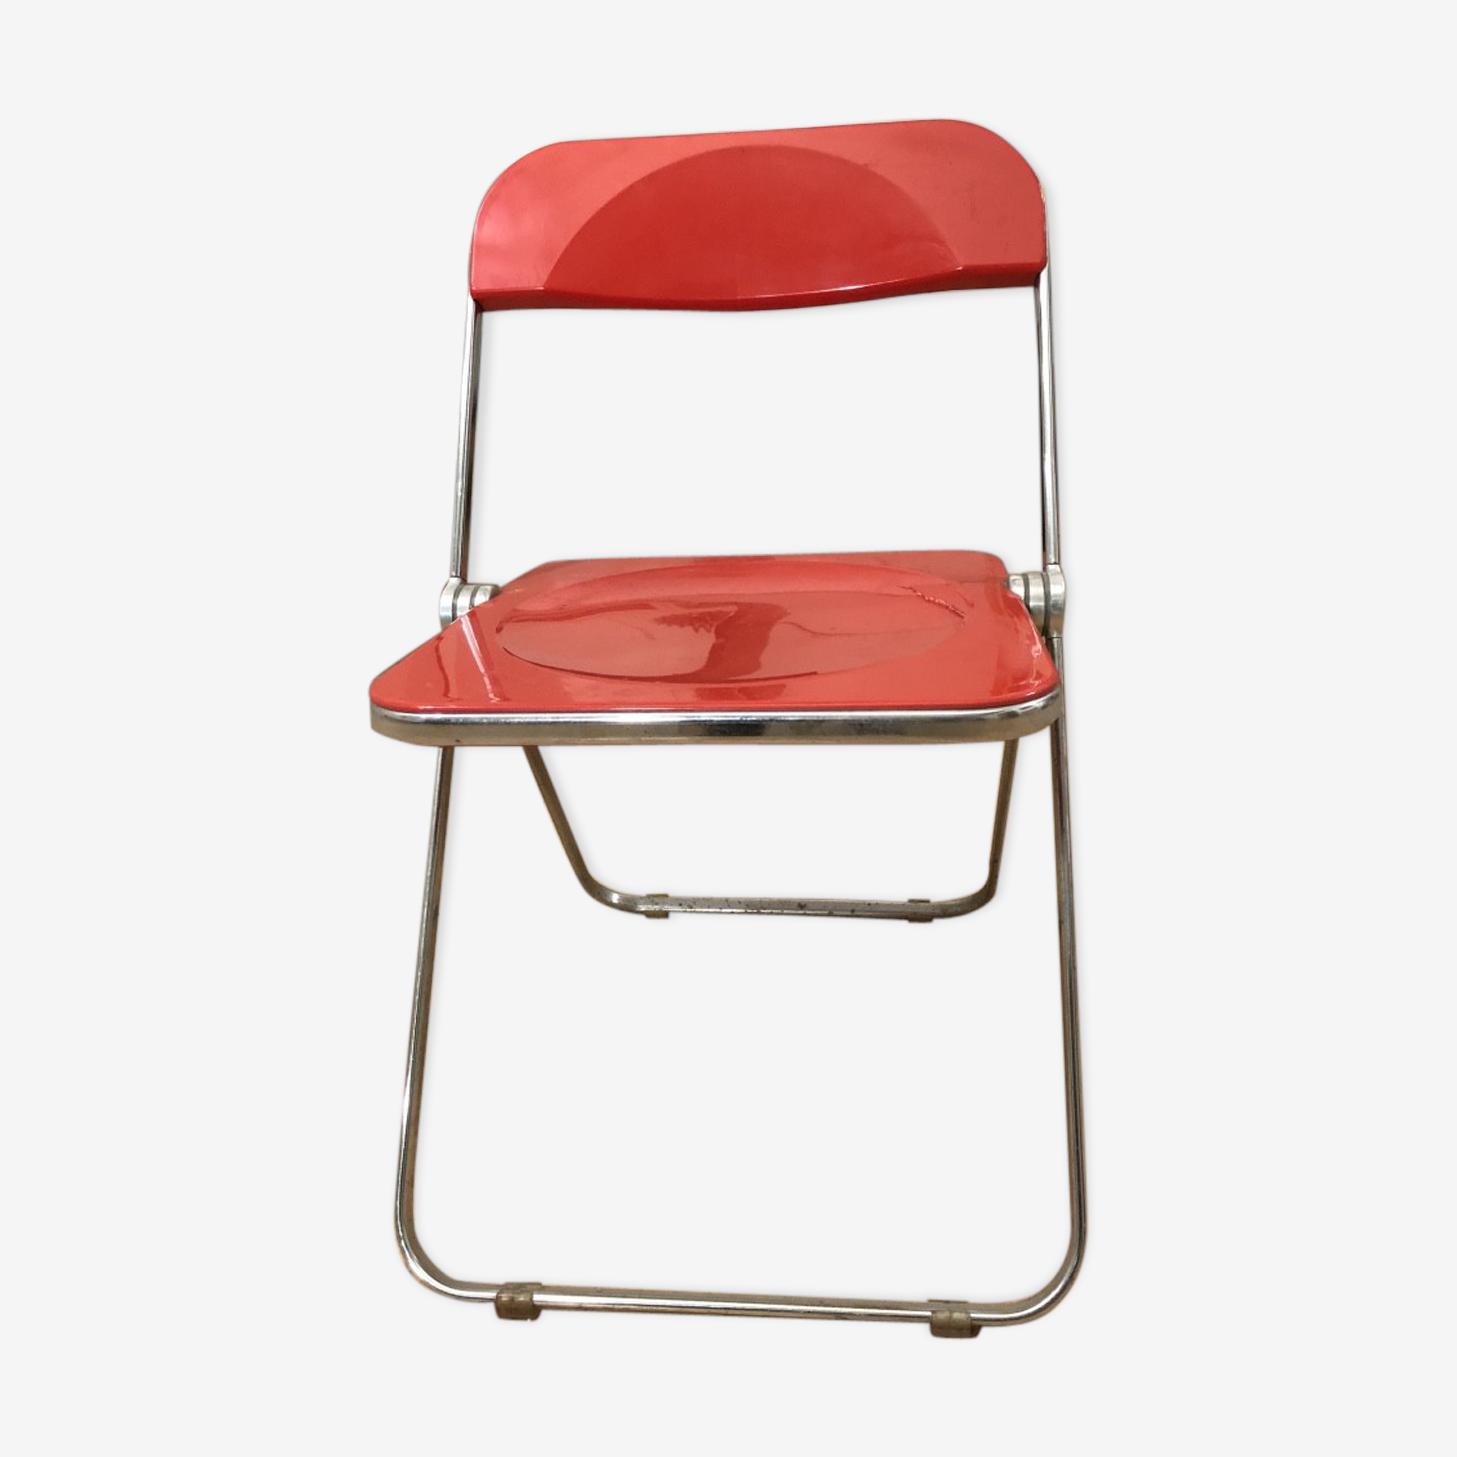 Italian designer bright red folding chair